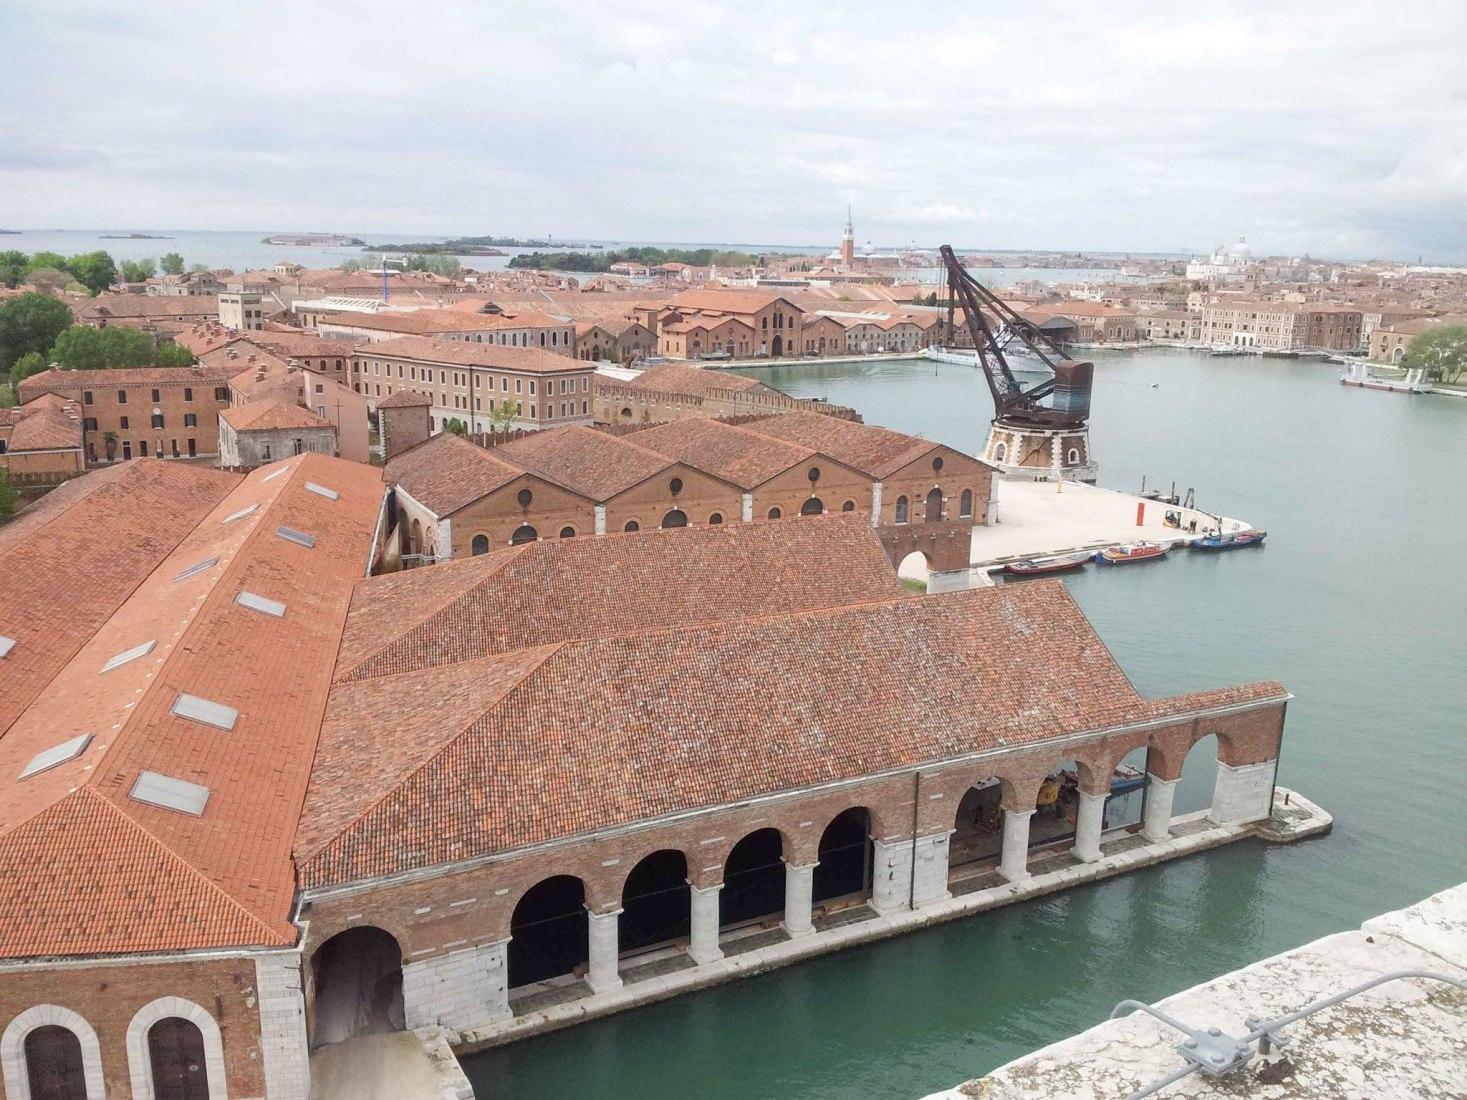 Overview Arsenale. Photograph by Andrea Avezzú. Image courtesy of La Biennale di Venezia.